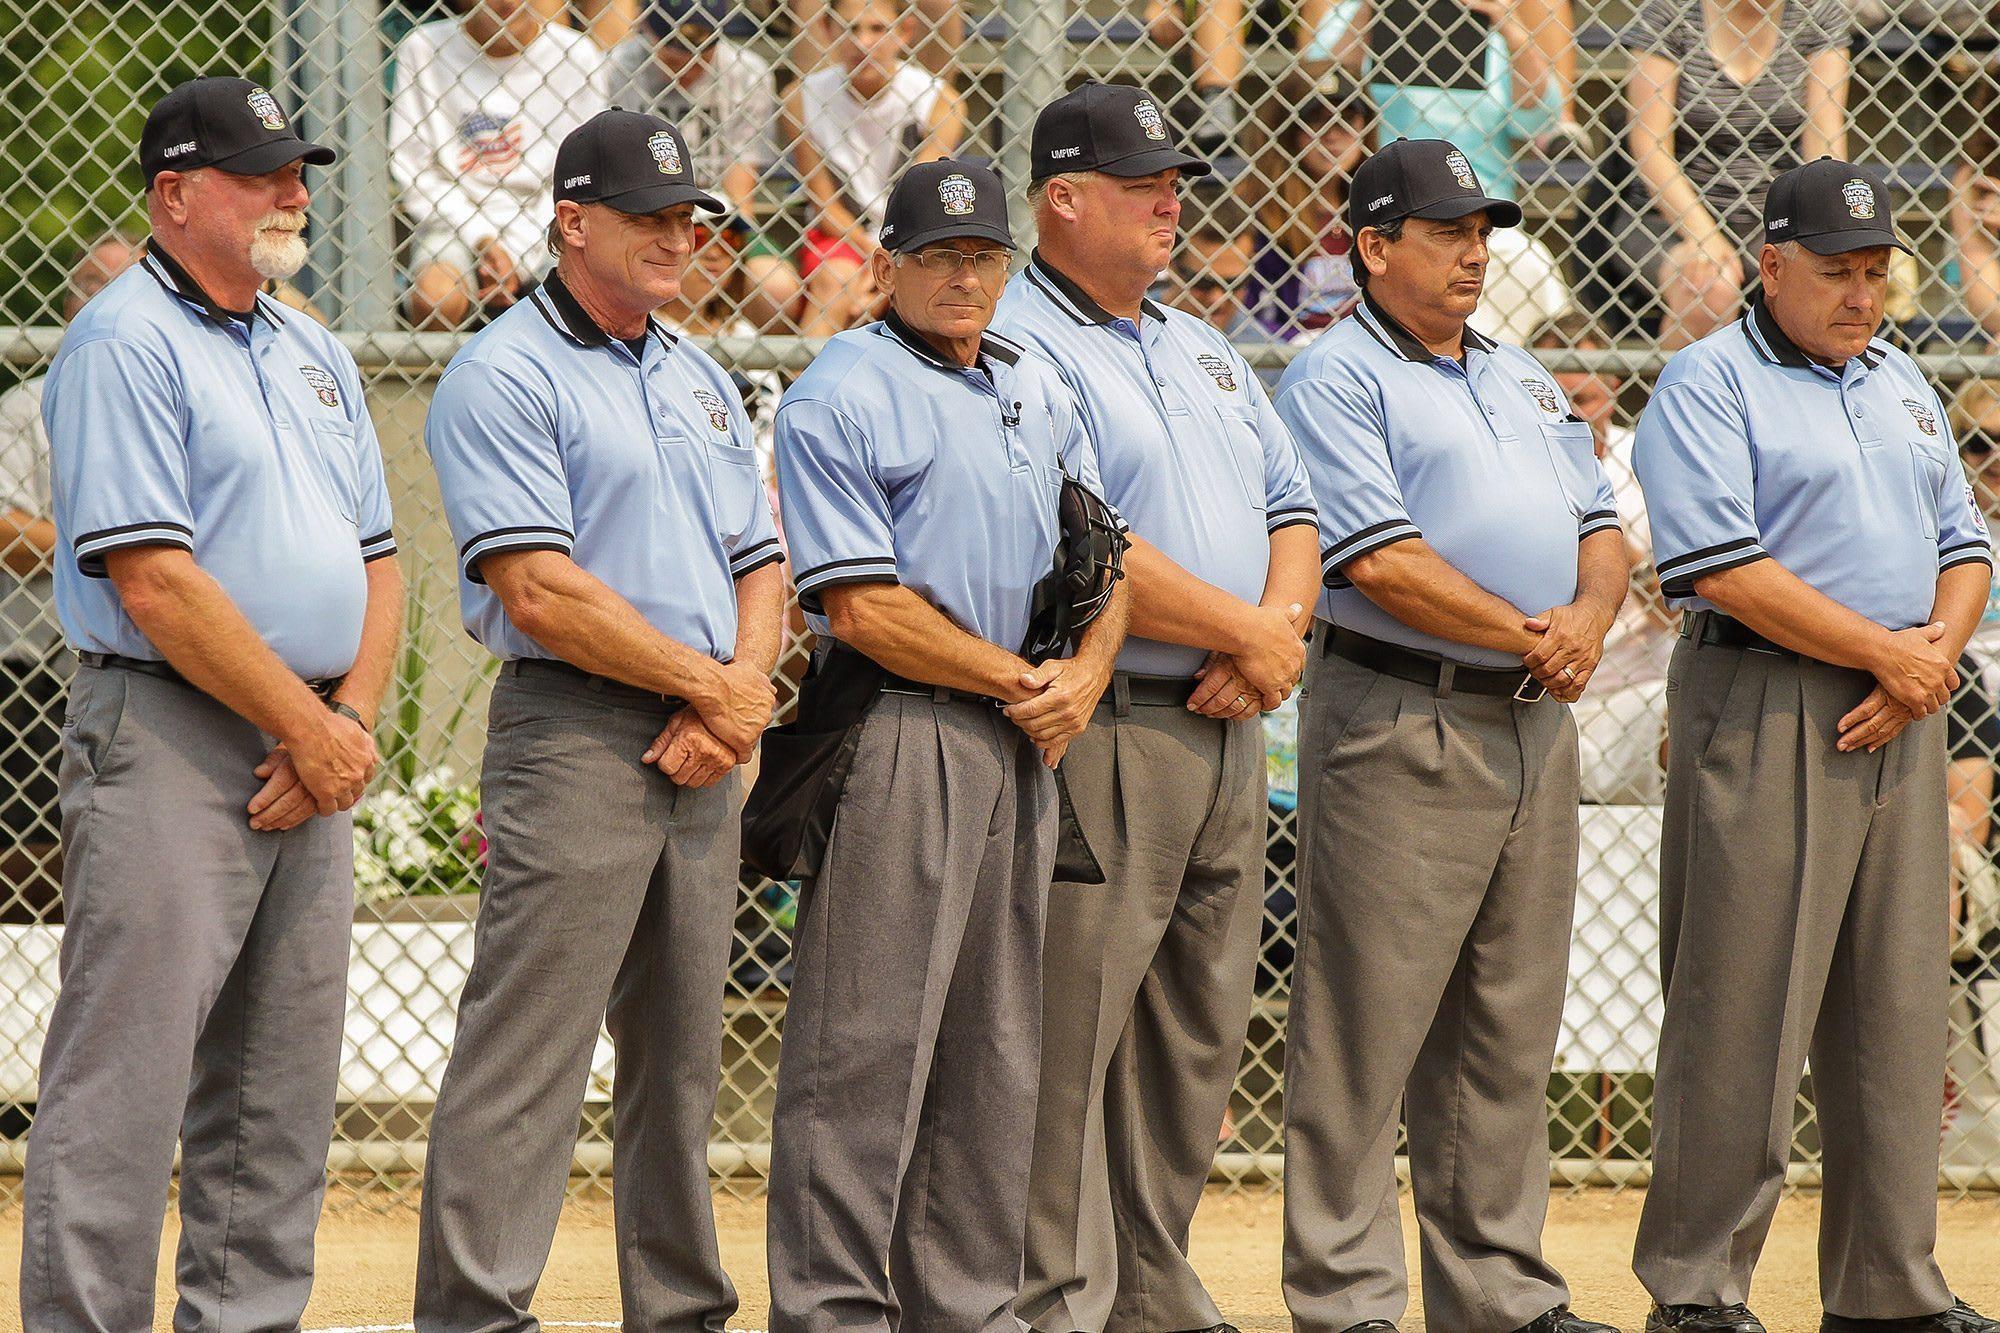 2018 LLWS Umpires